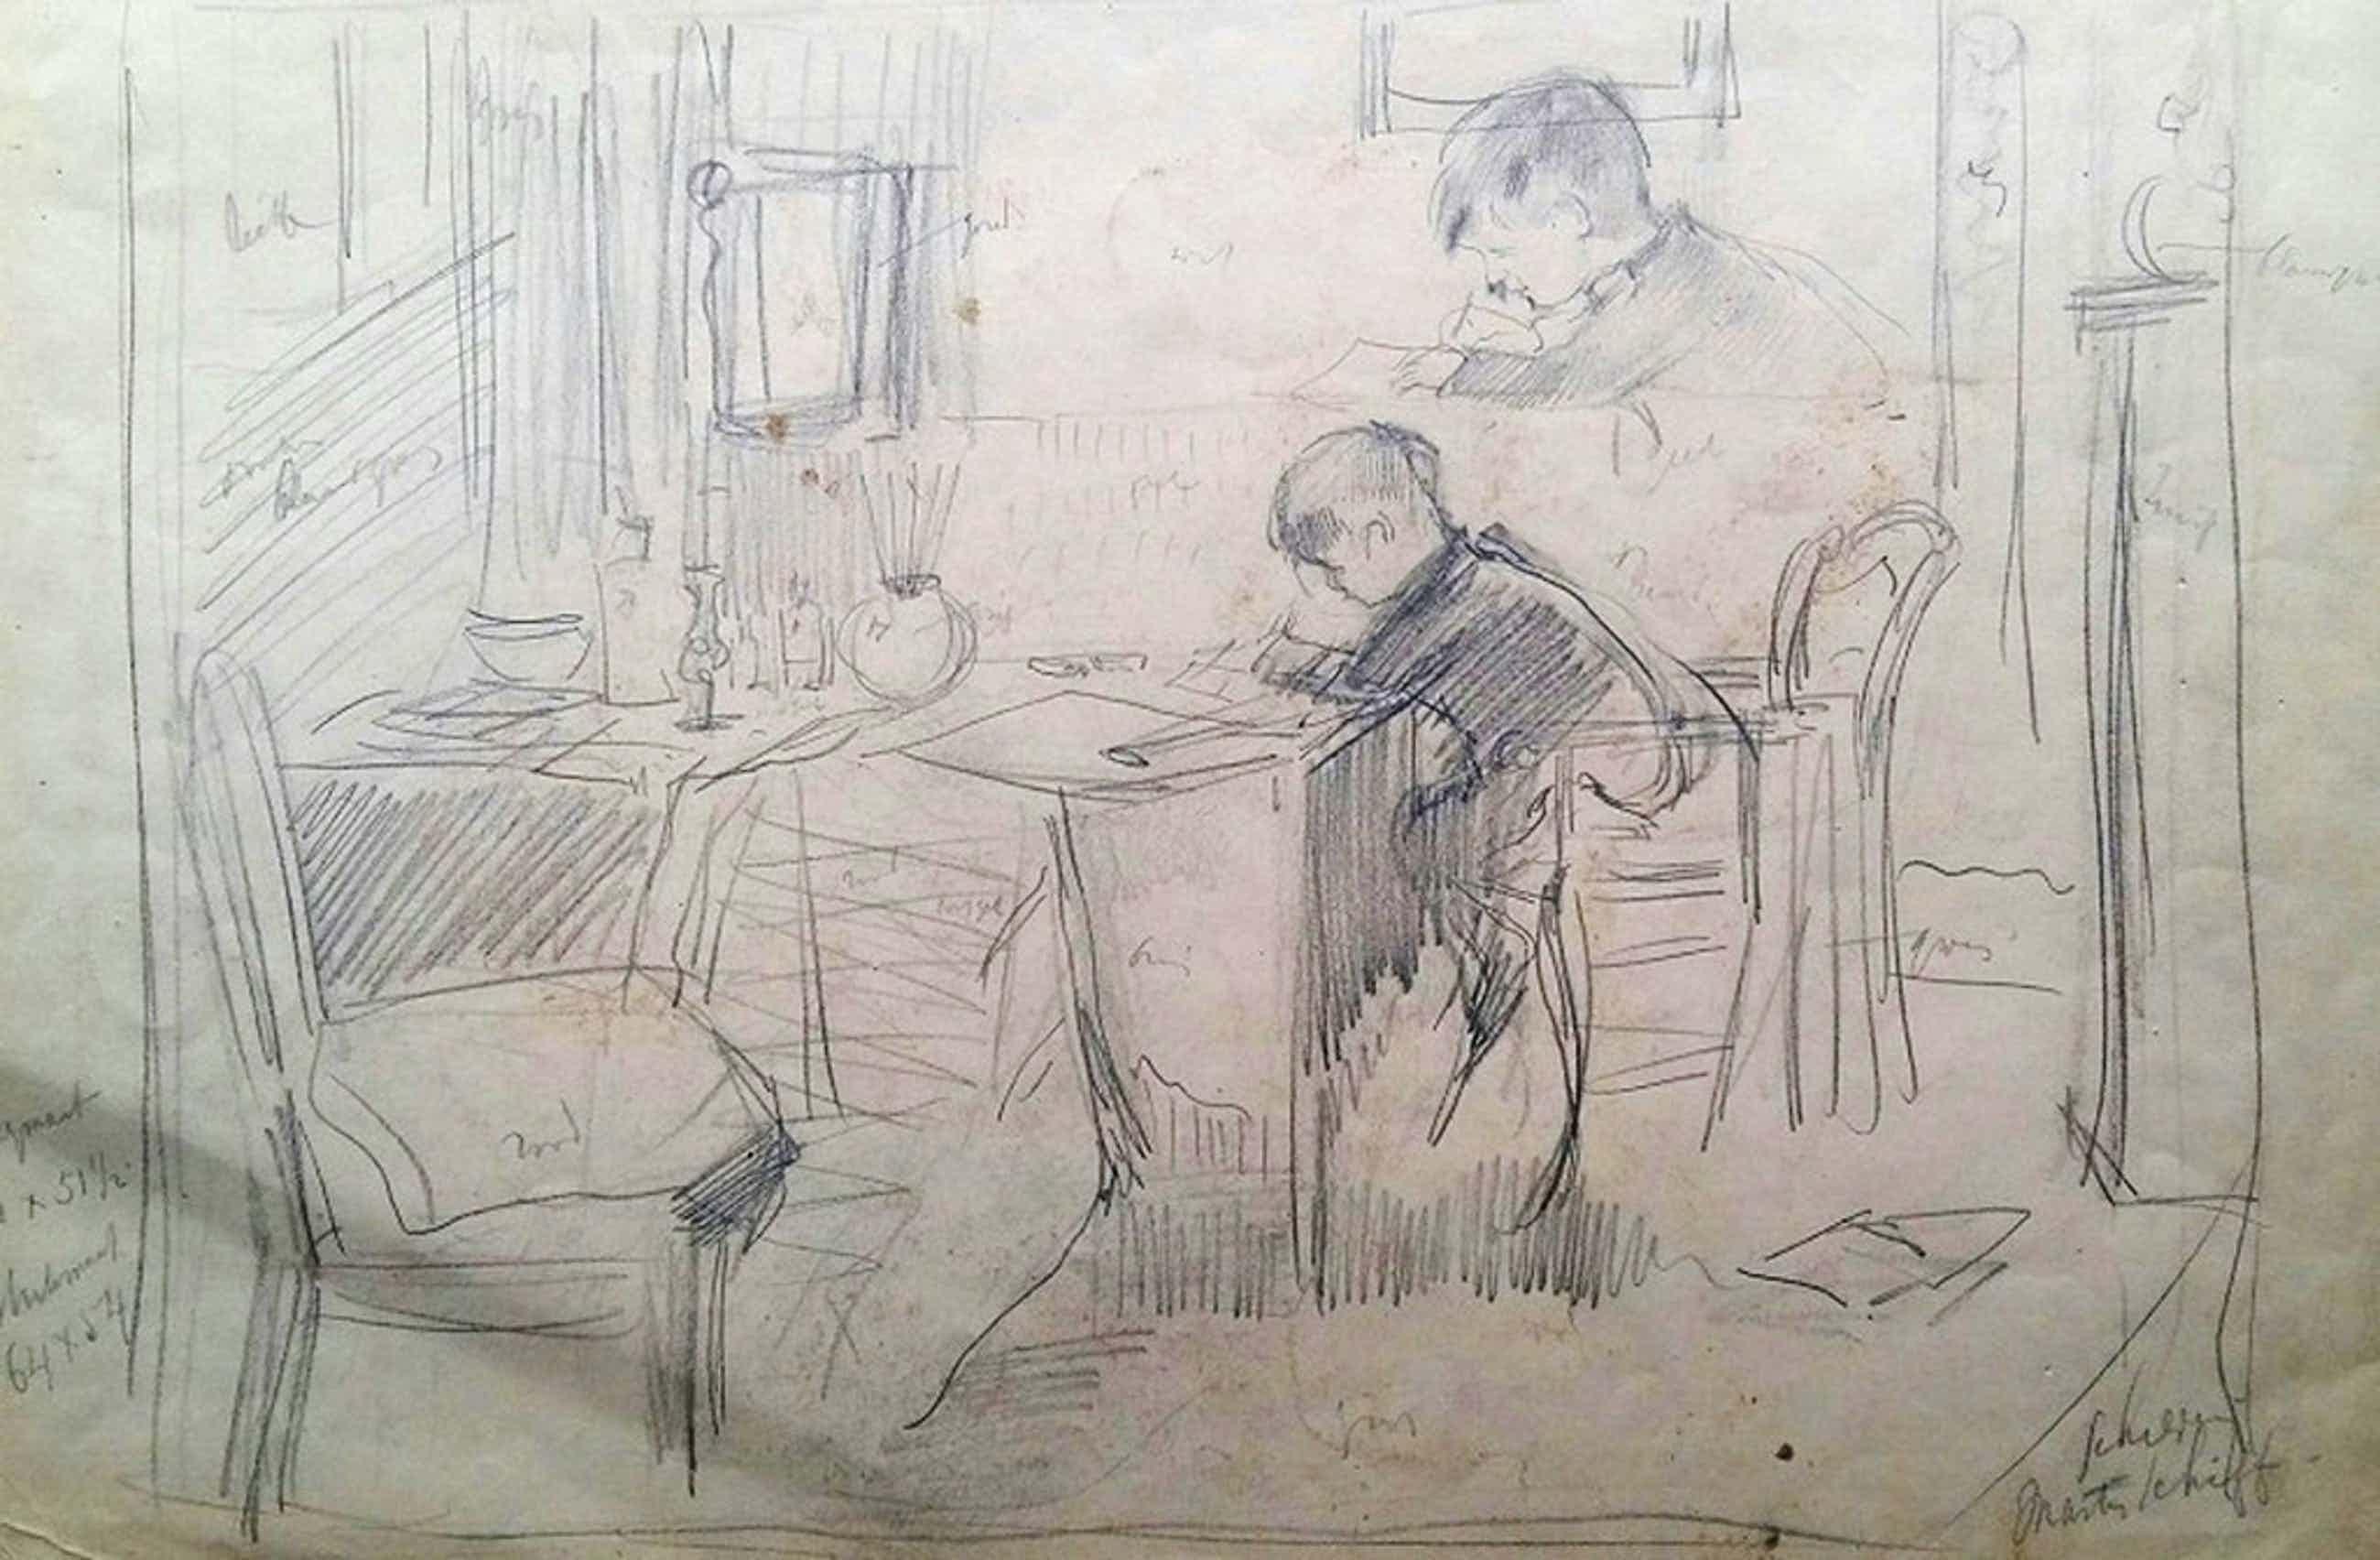 Saloman GARF (Amsterdam, 1879 - Auschwitz, 1943) Potloodtekening + litho kopen? Bied vanaf 40!